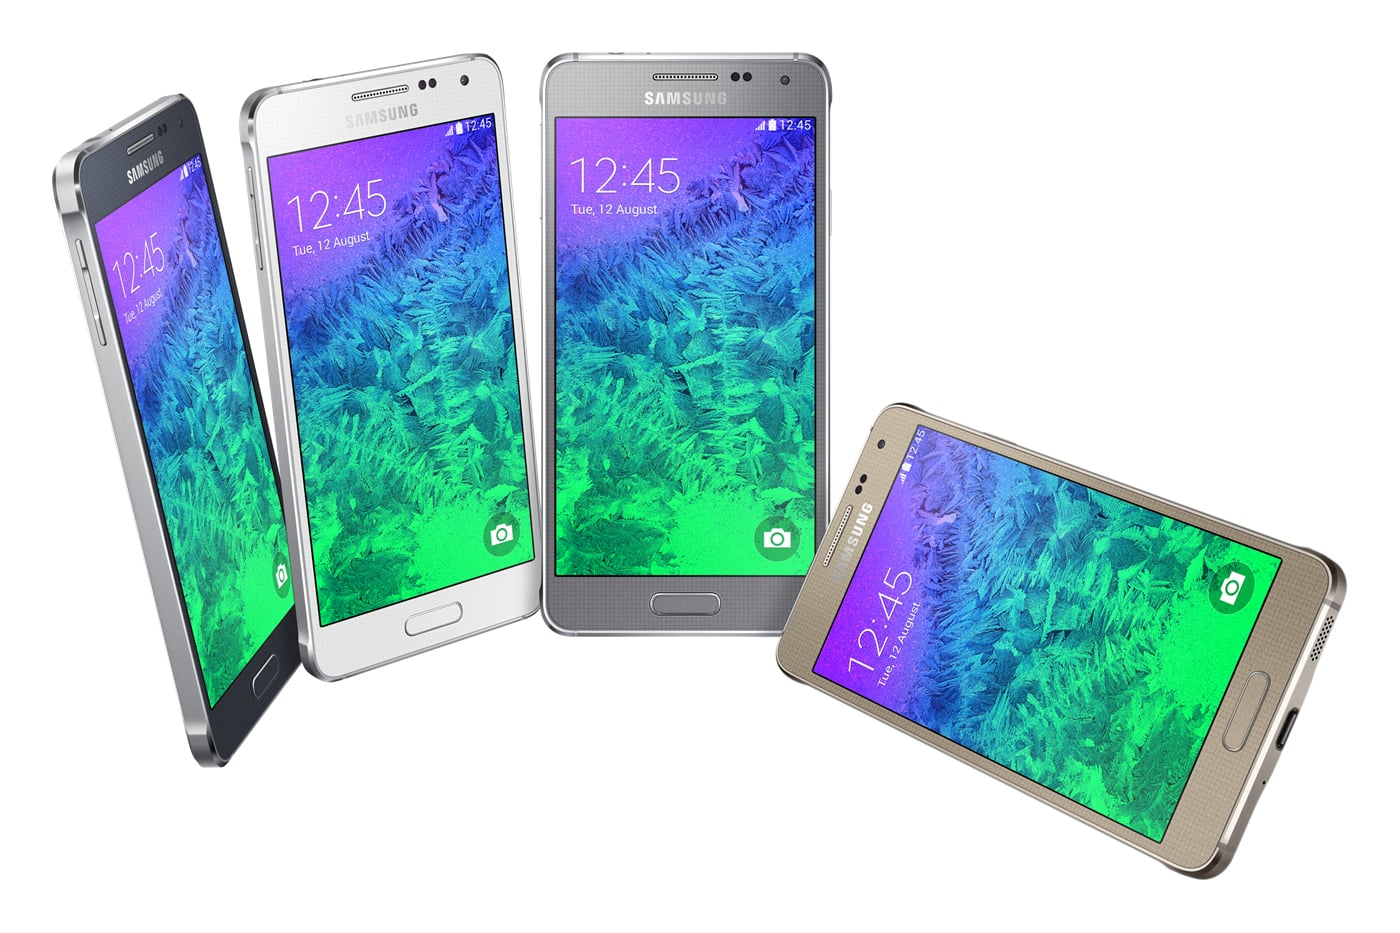 Samsung_Galaxy_Alpha_release_date 4 أسباب تجعل الهاتف Galaxy Alpha من سامسونج خيارا جيدا الأن